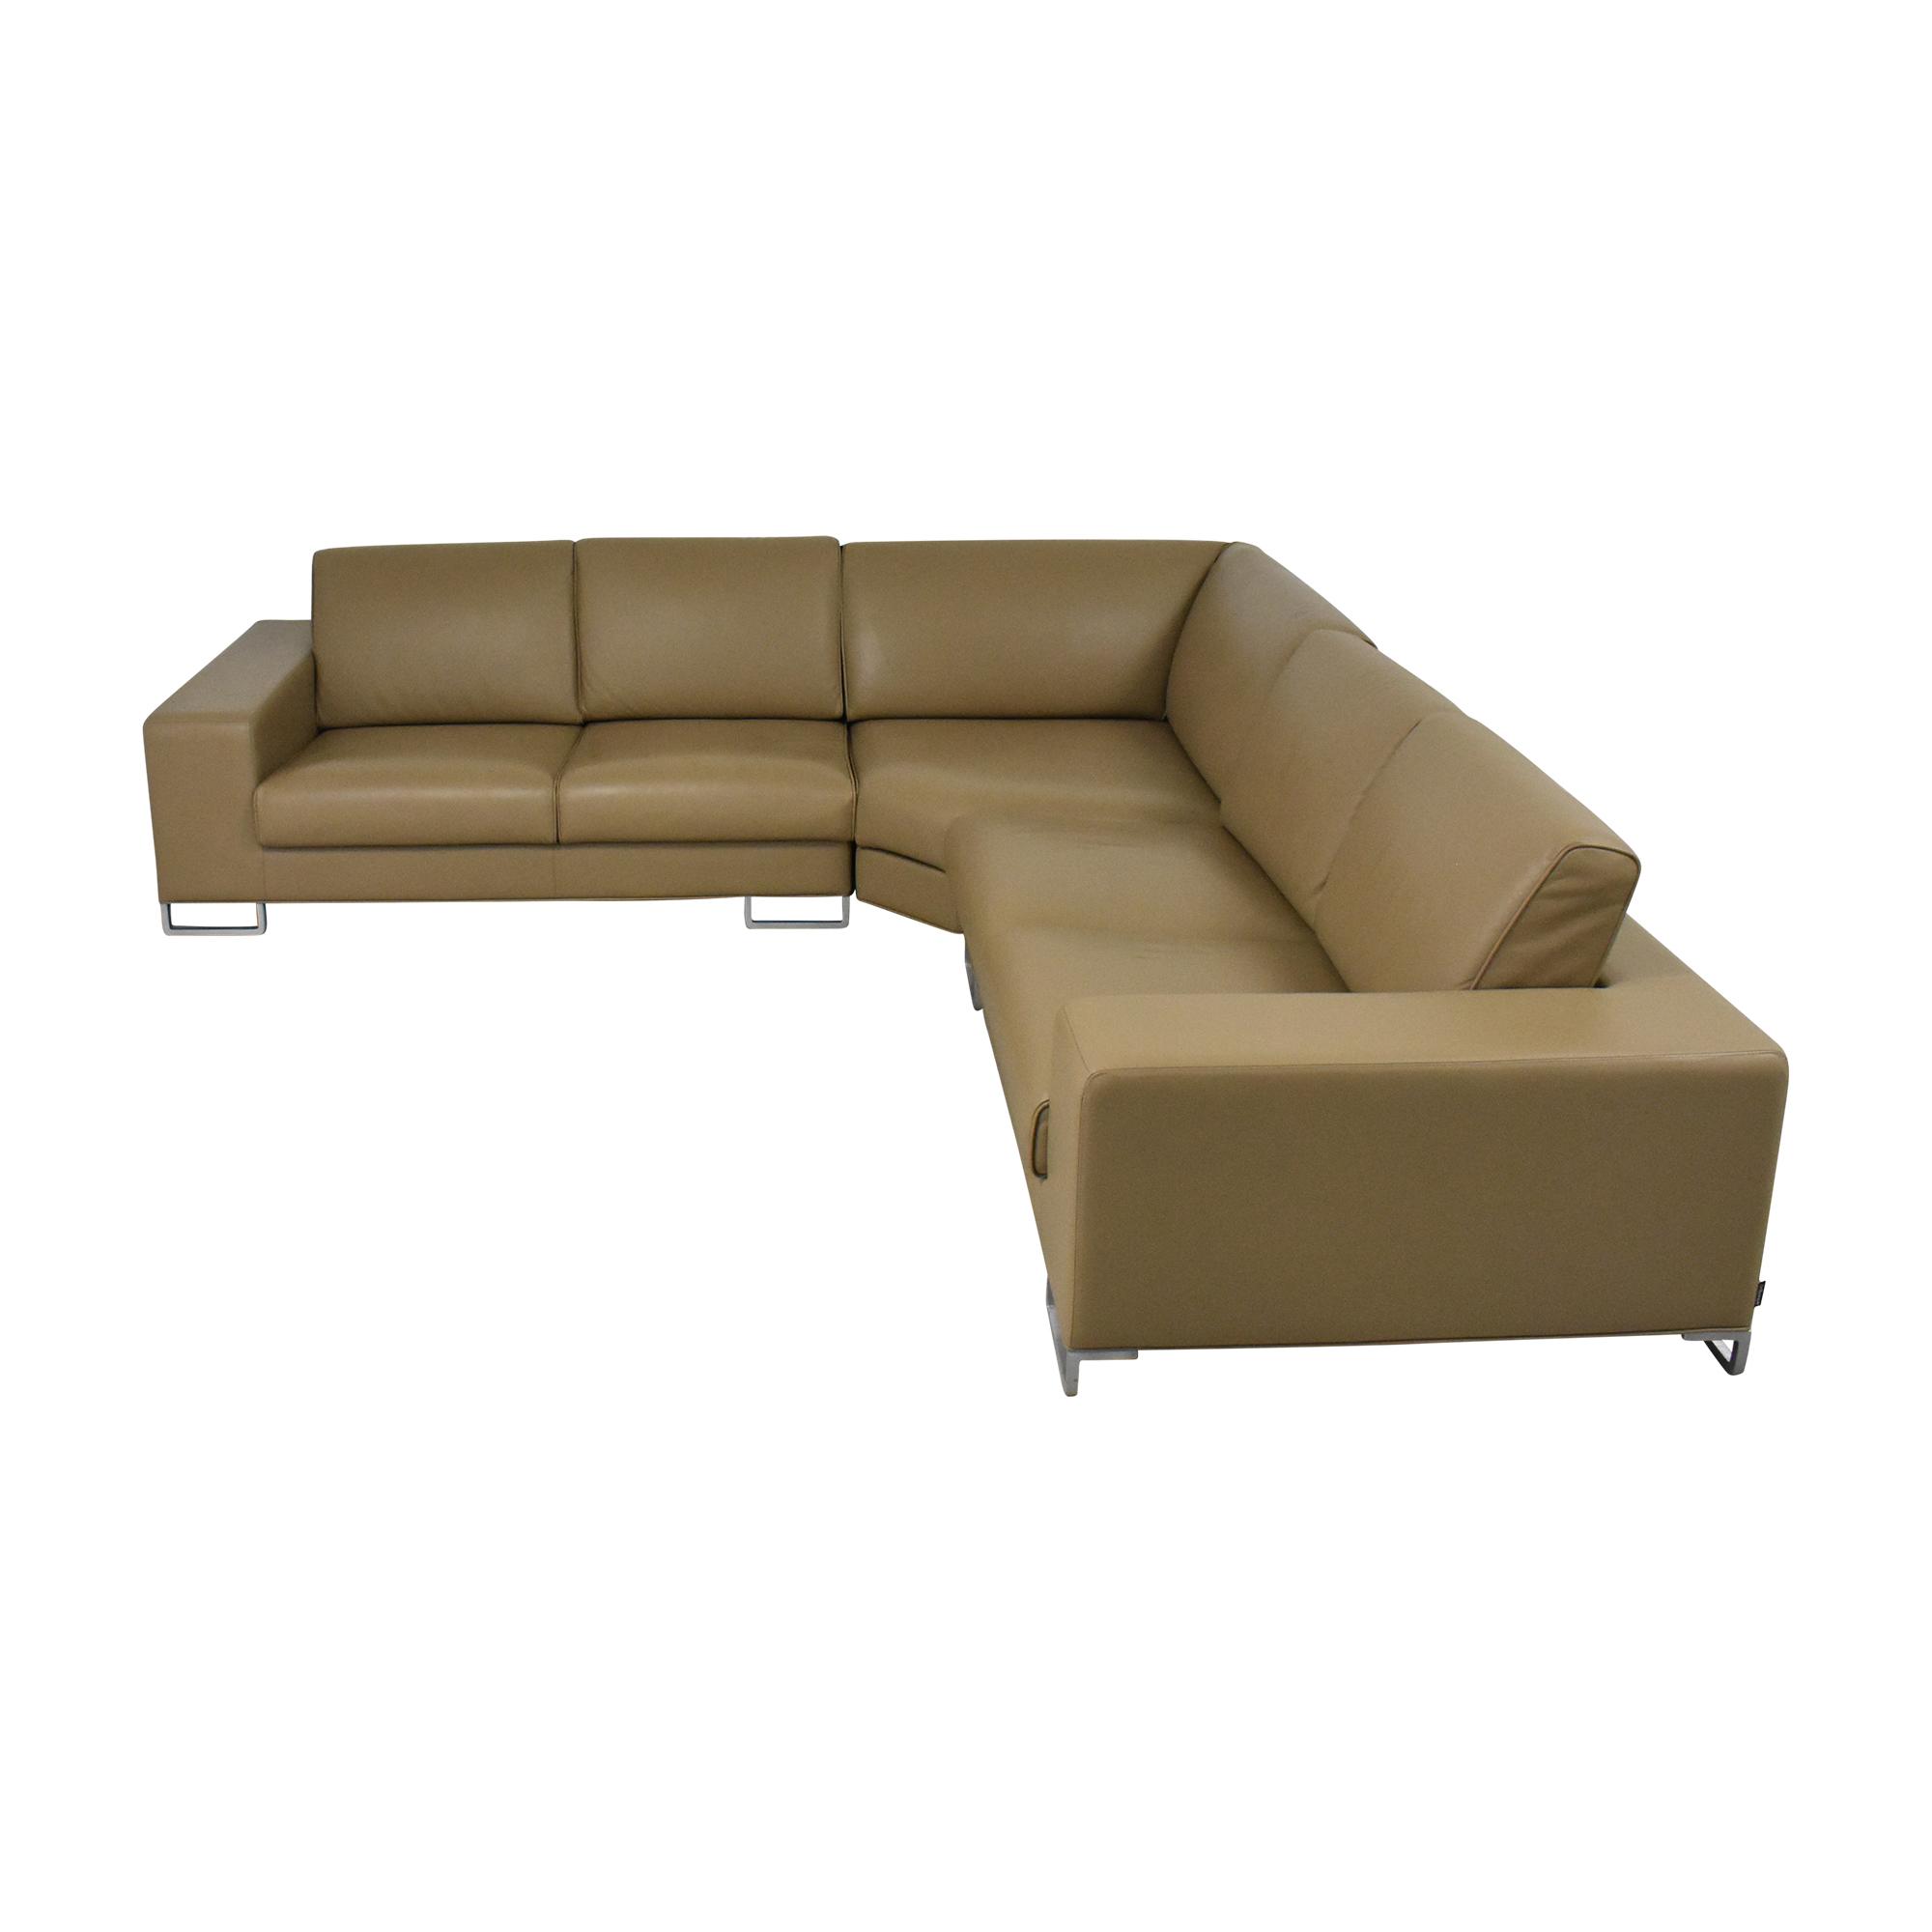 Arketipo Arketipo XL Sofa Sofas